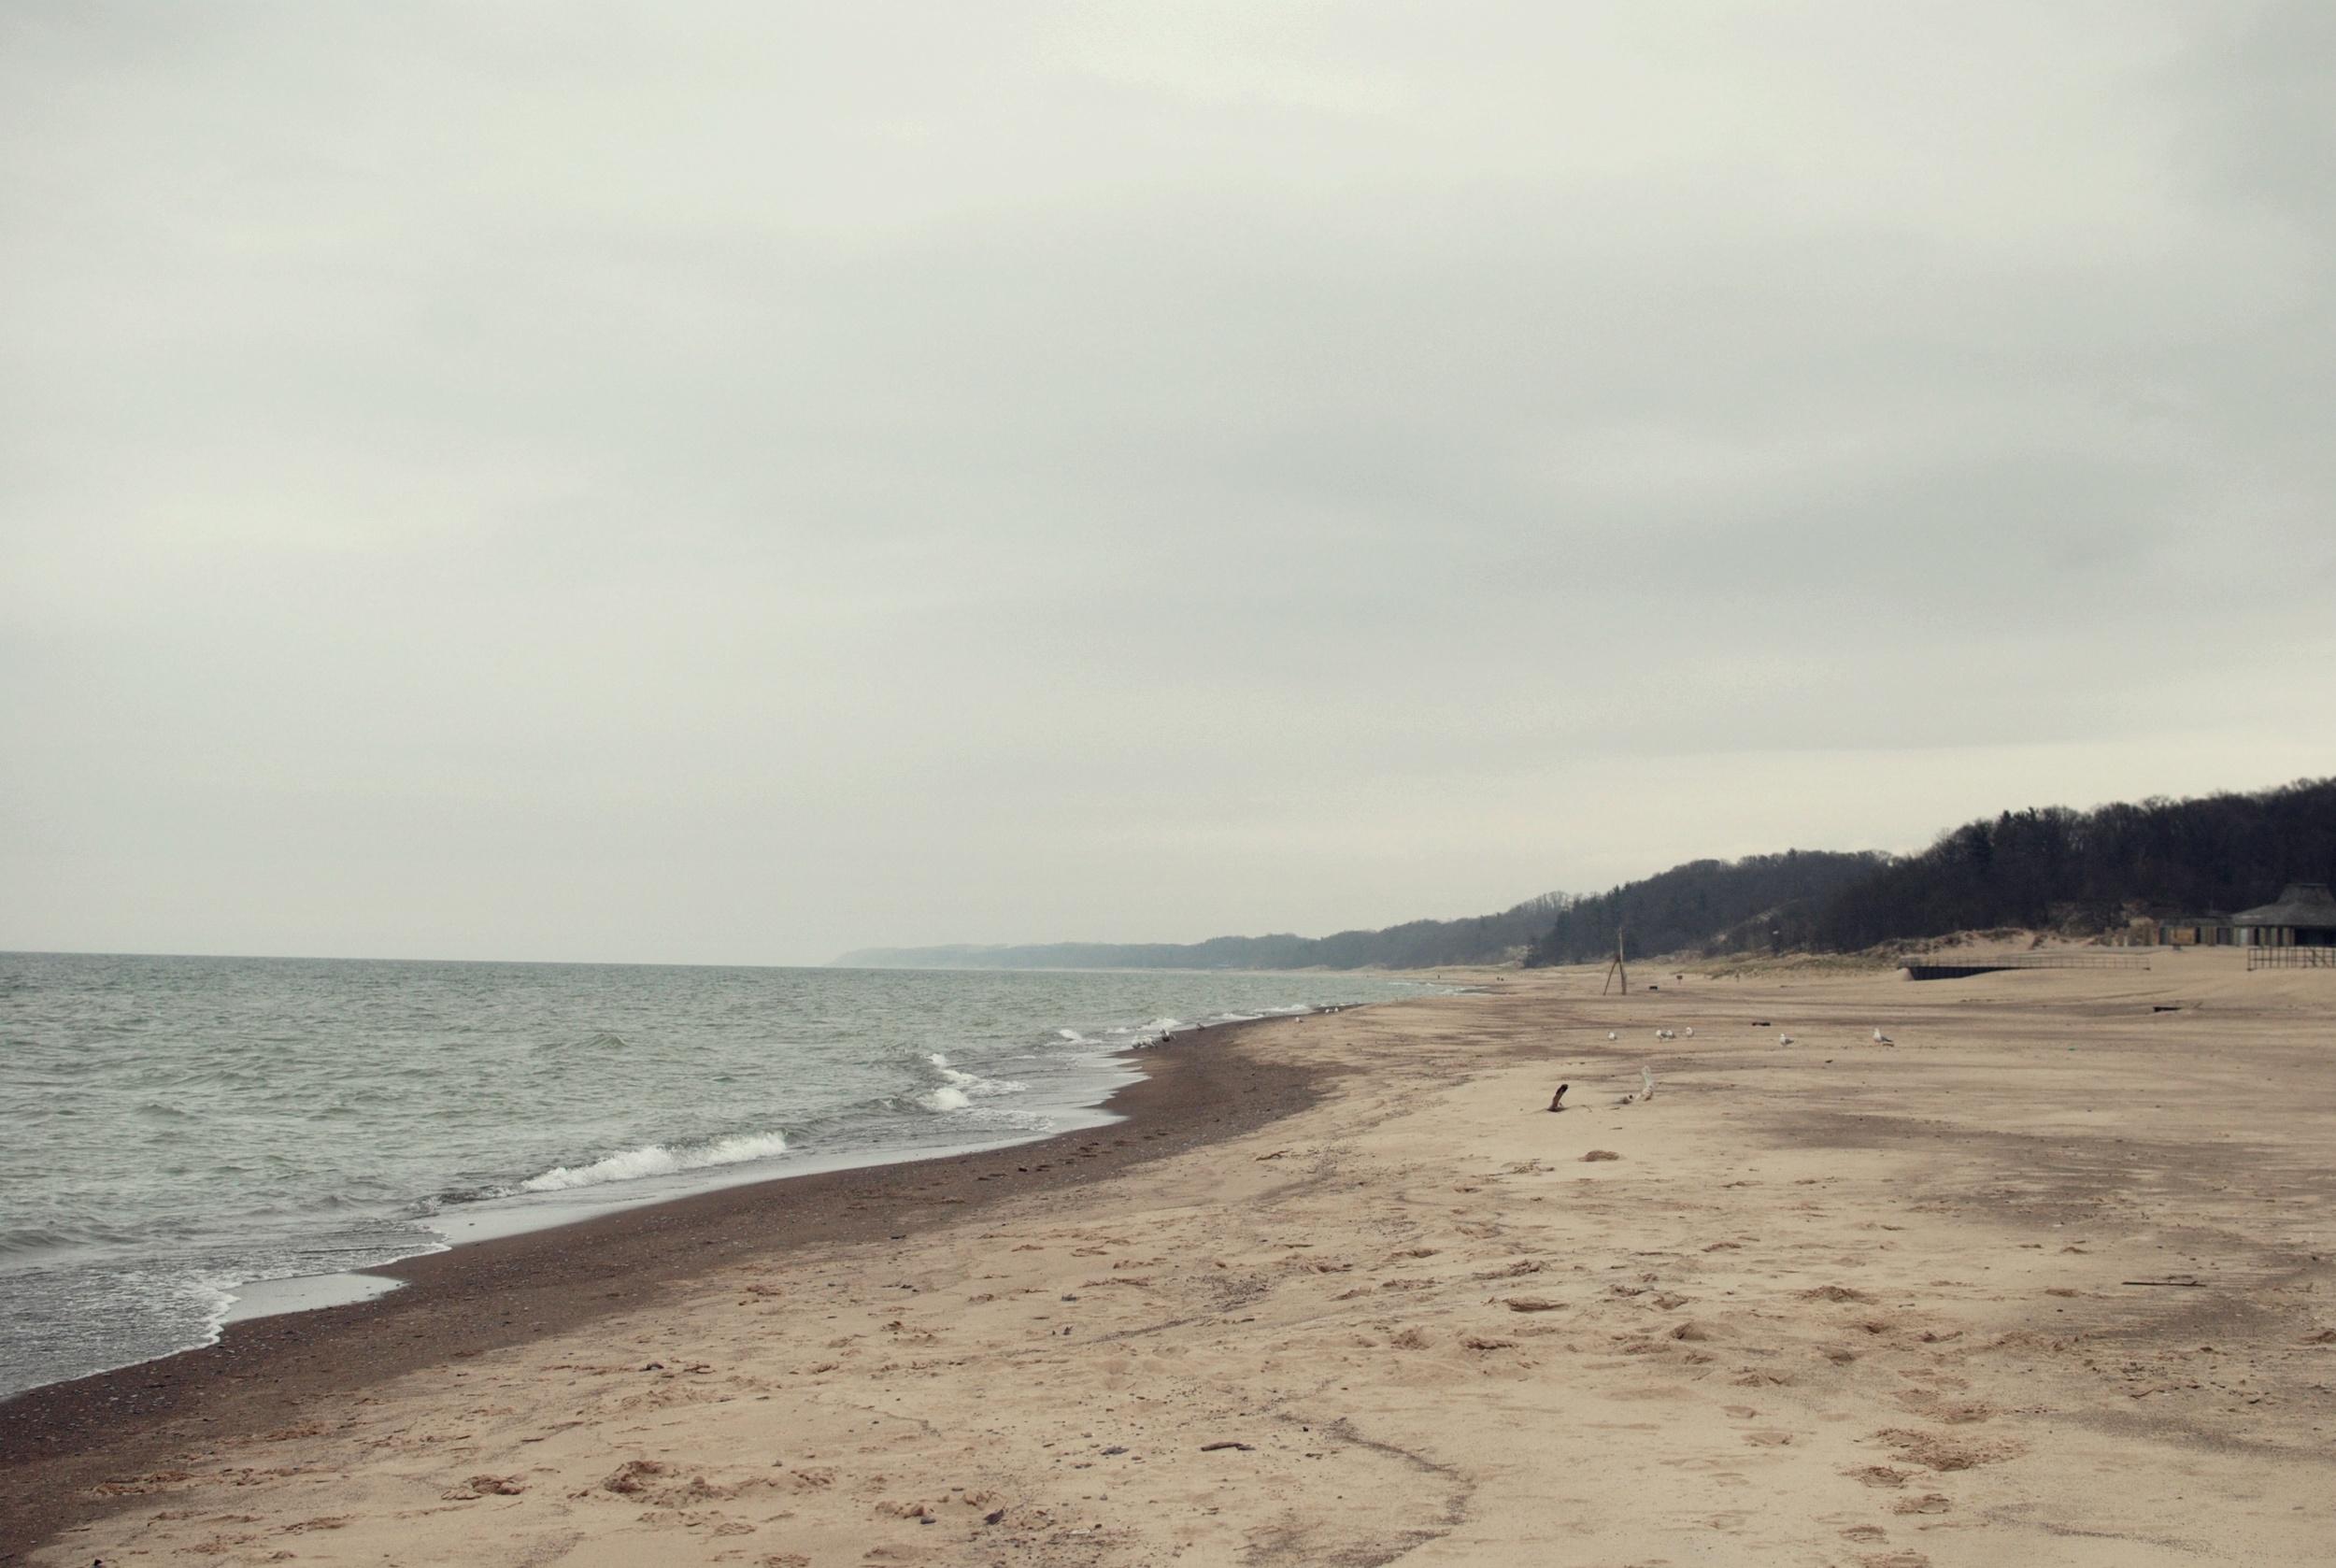 South-eastern Lake Michigan